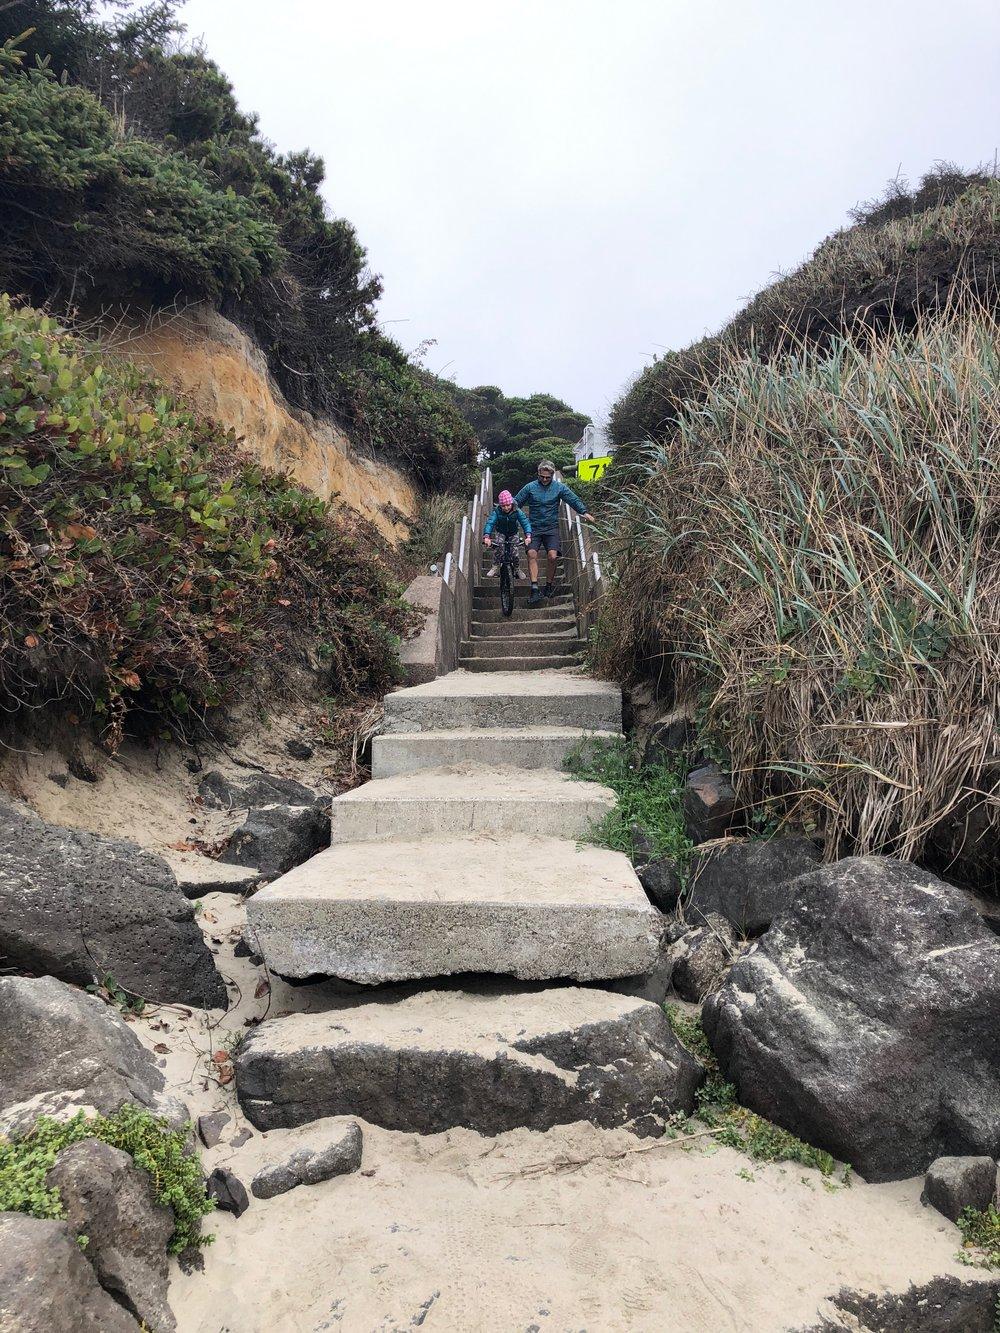 Isla biking down the stairs from camp to Tillicum Beach